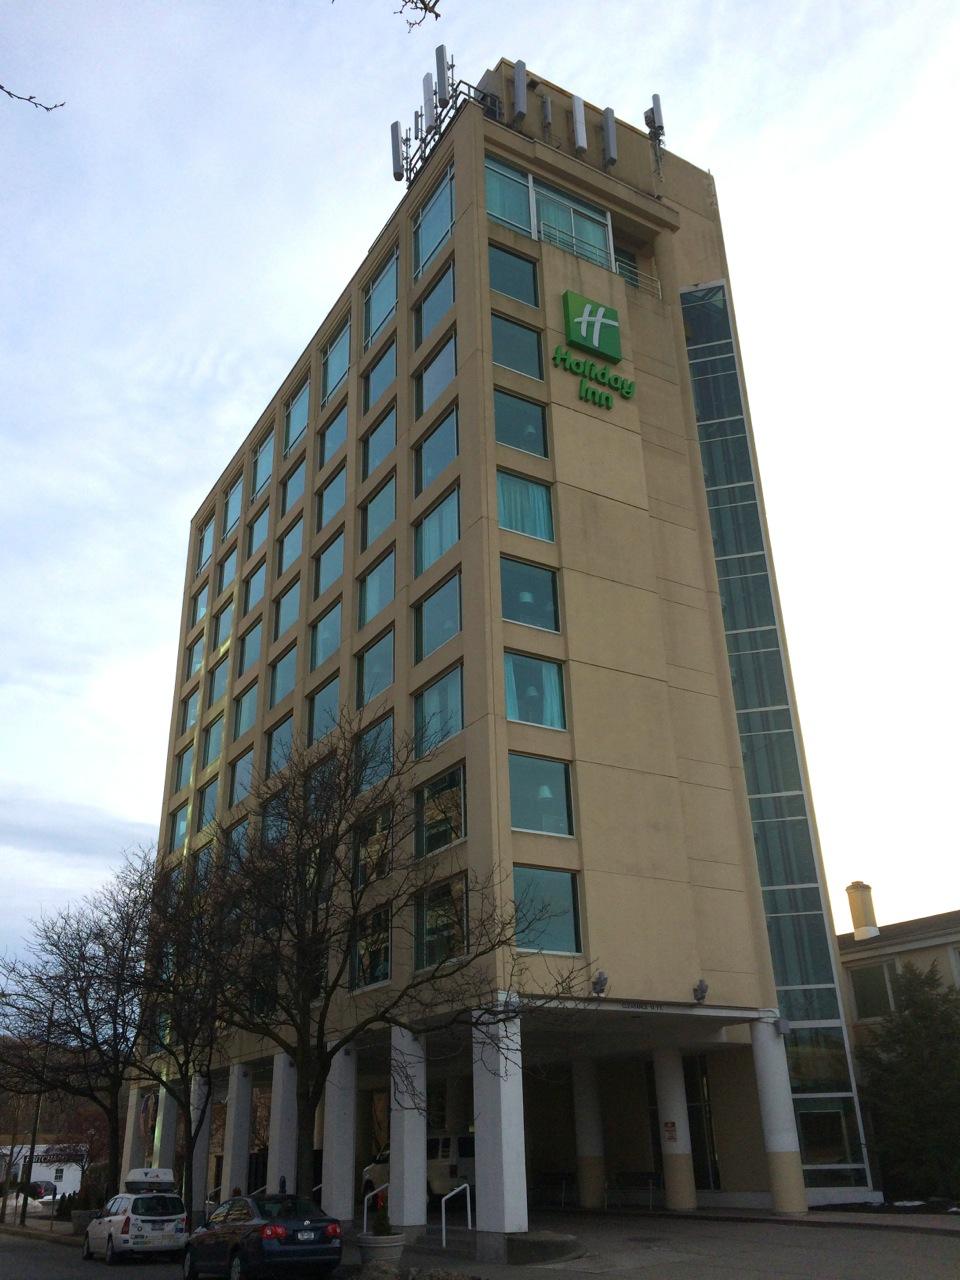 Hotel_Ithaca_0224141